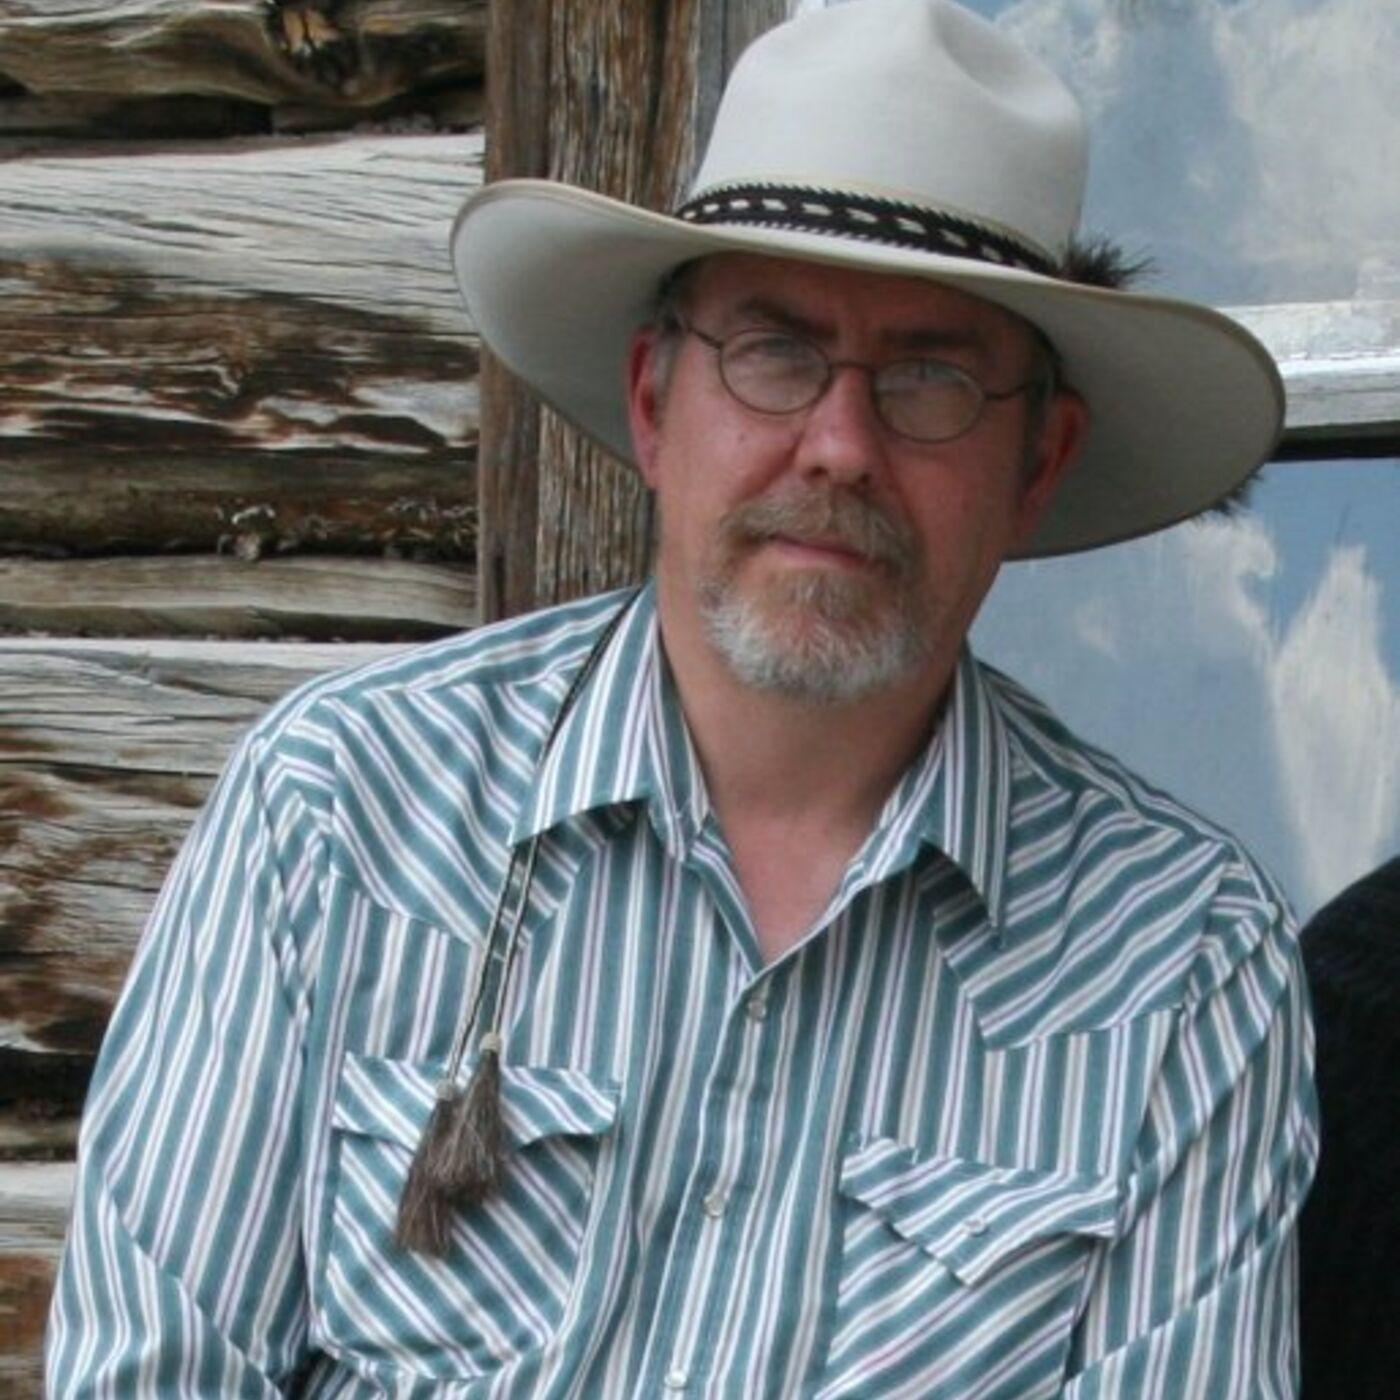 Meet Cowboy Recording Artist Joe Walus